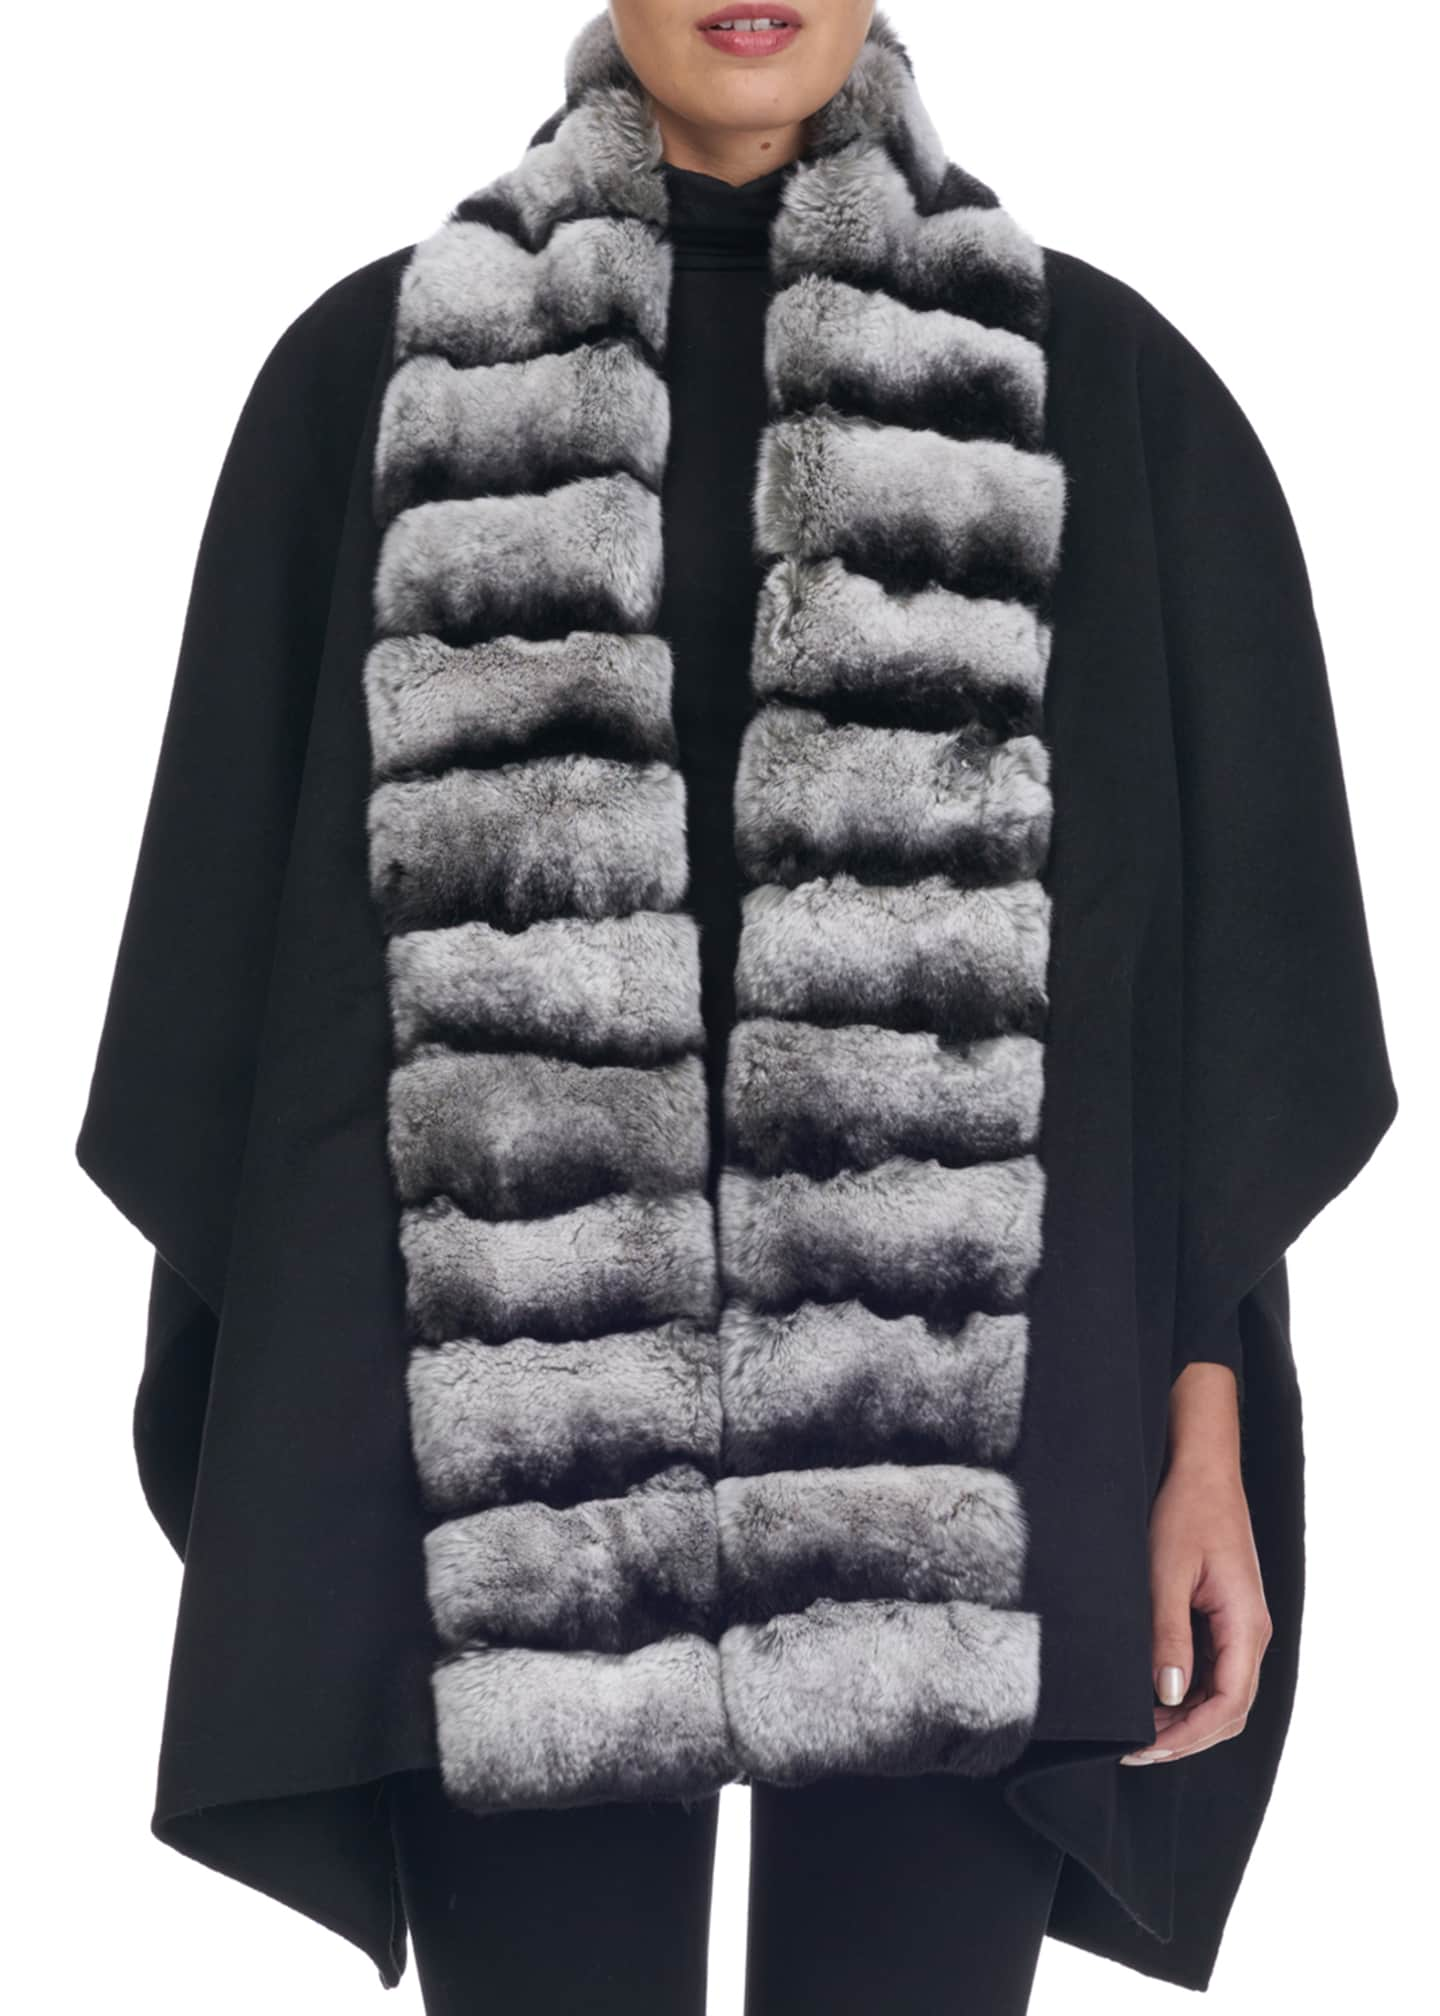 Gorski Wool Cape w/ Fur Collar Trim